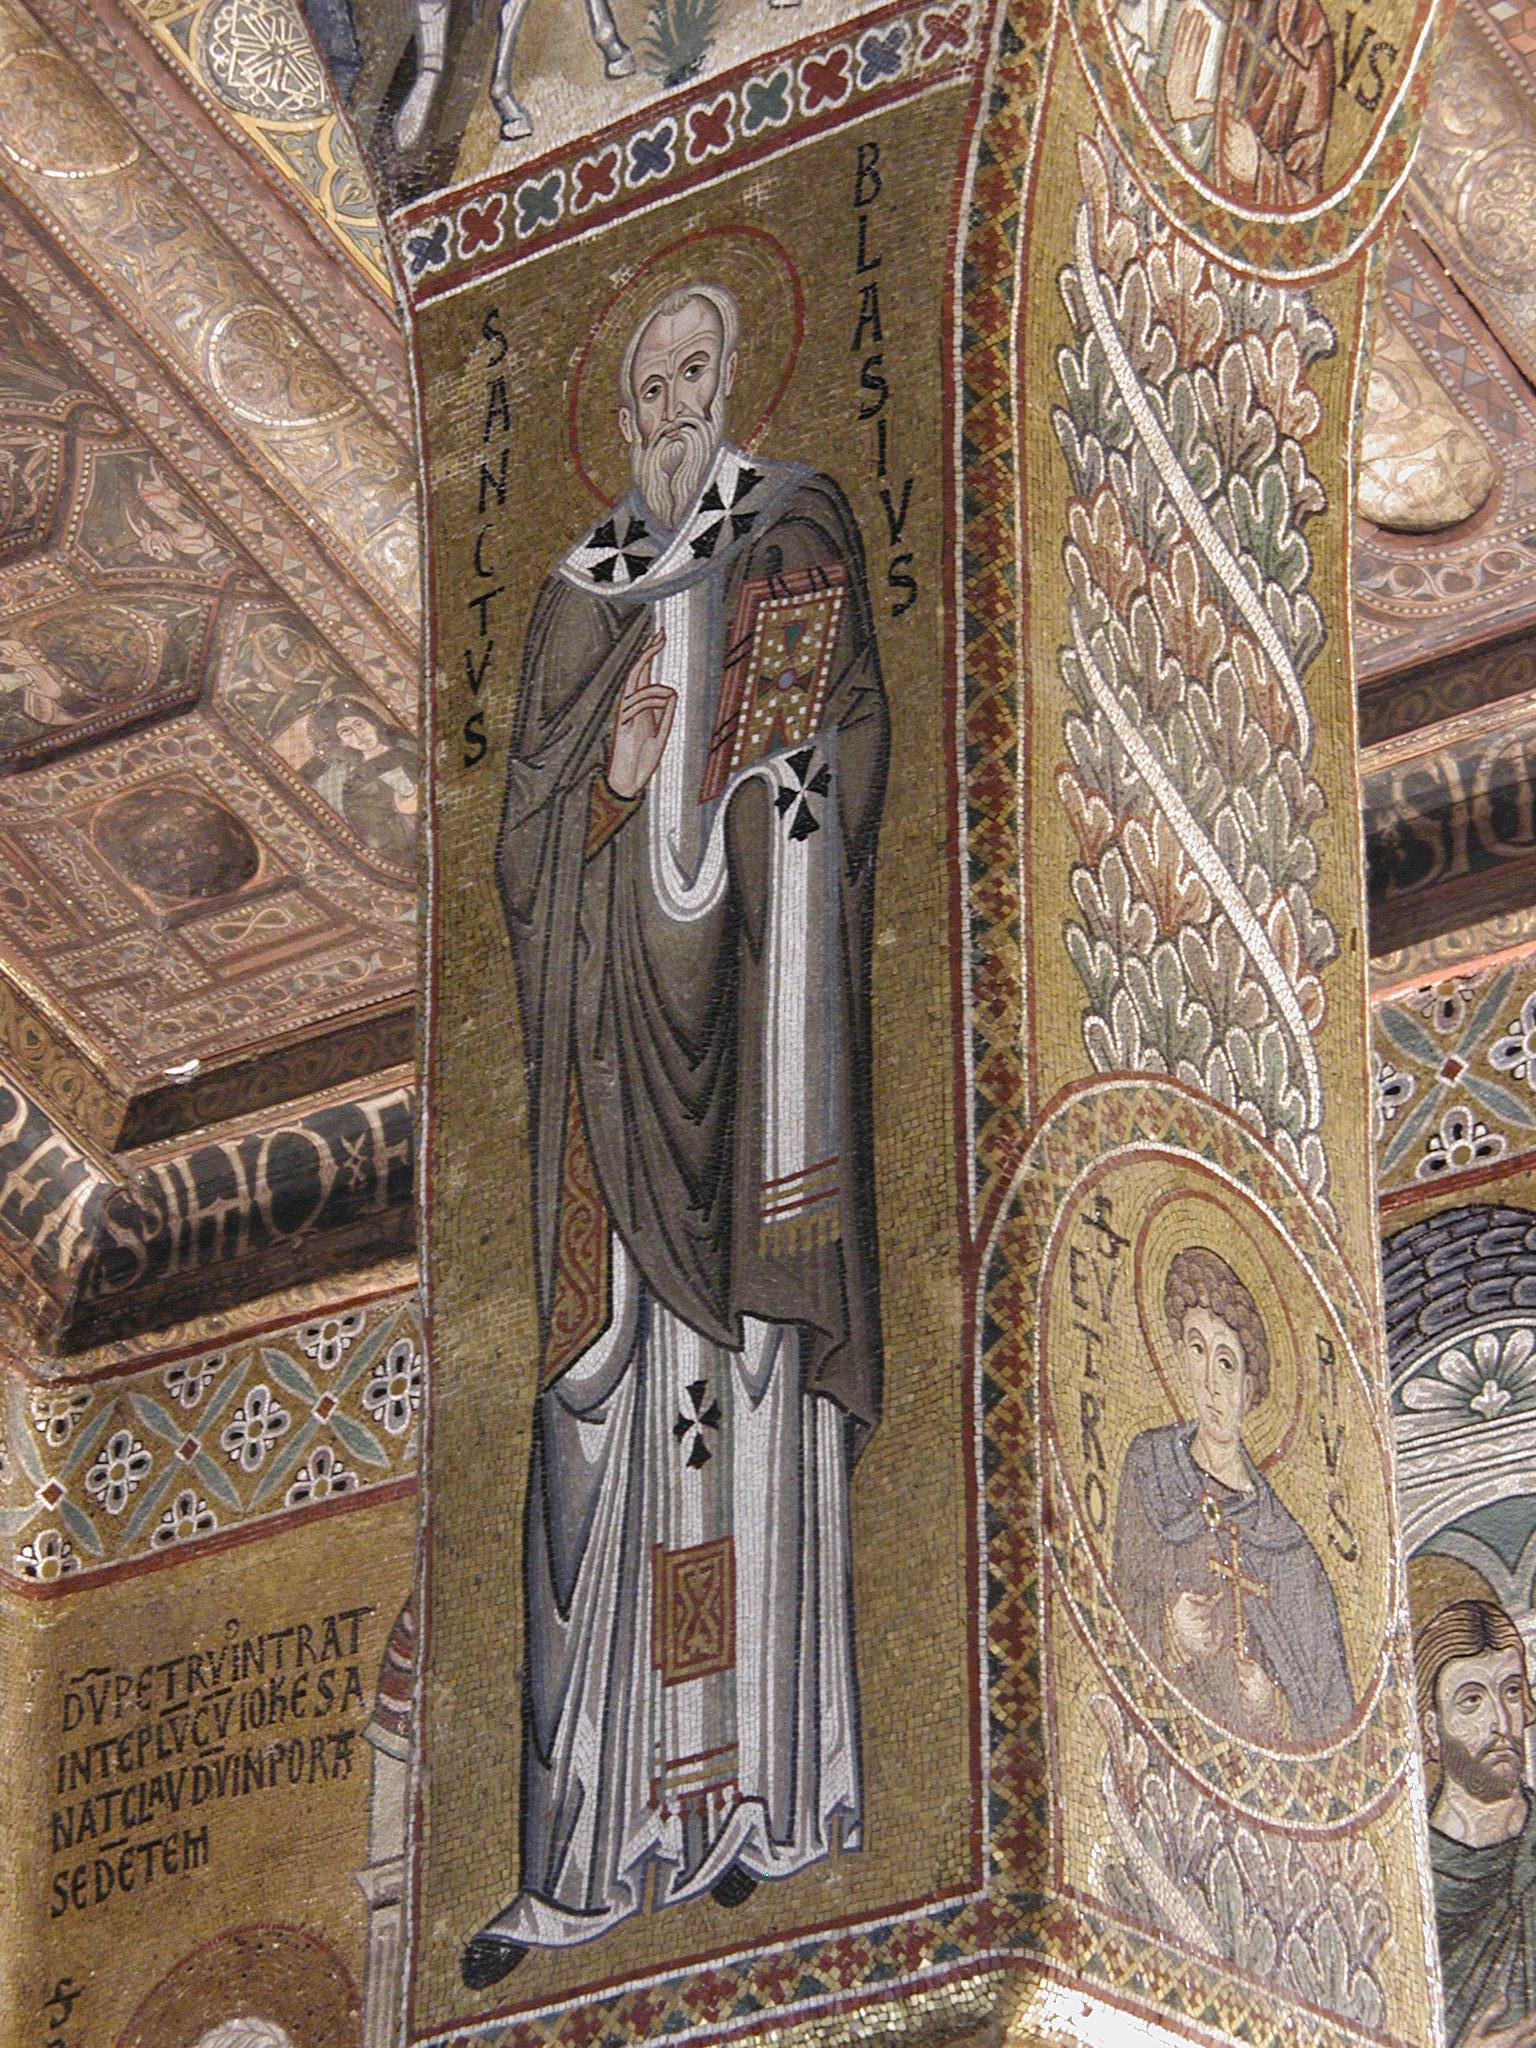 http://rubens.anu.edu.au/raid1cdroms/sicily/palermo/churches/cappella_palatina/nave/mosaics_to_north/P1012434.JPG